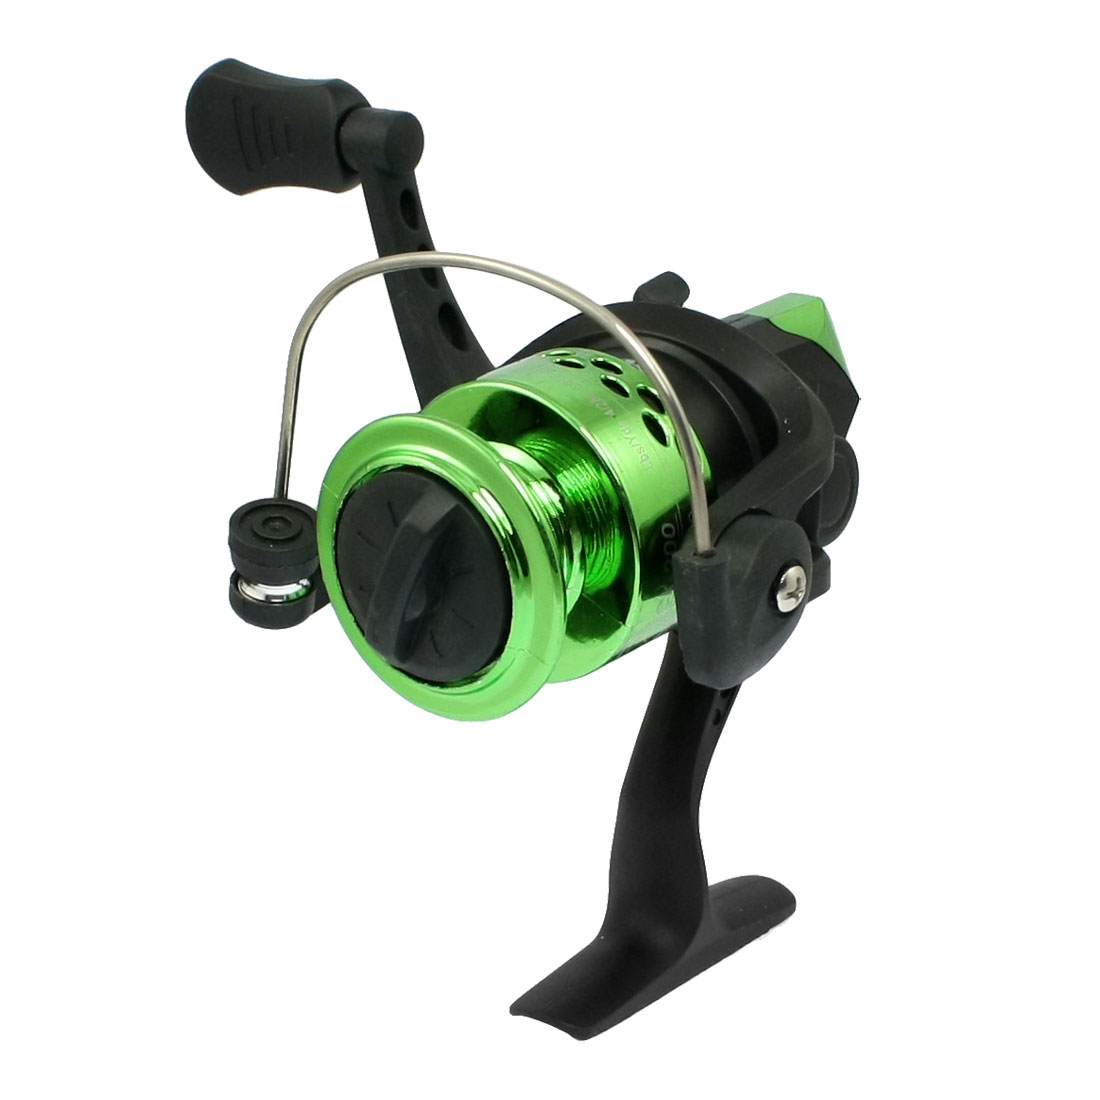 Green Gear Ratio 5.2:1 1-Ball Bearing Fishing Spinning Reel CK200